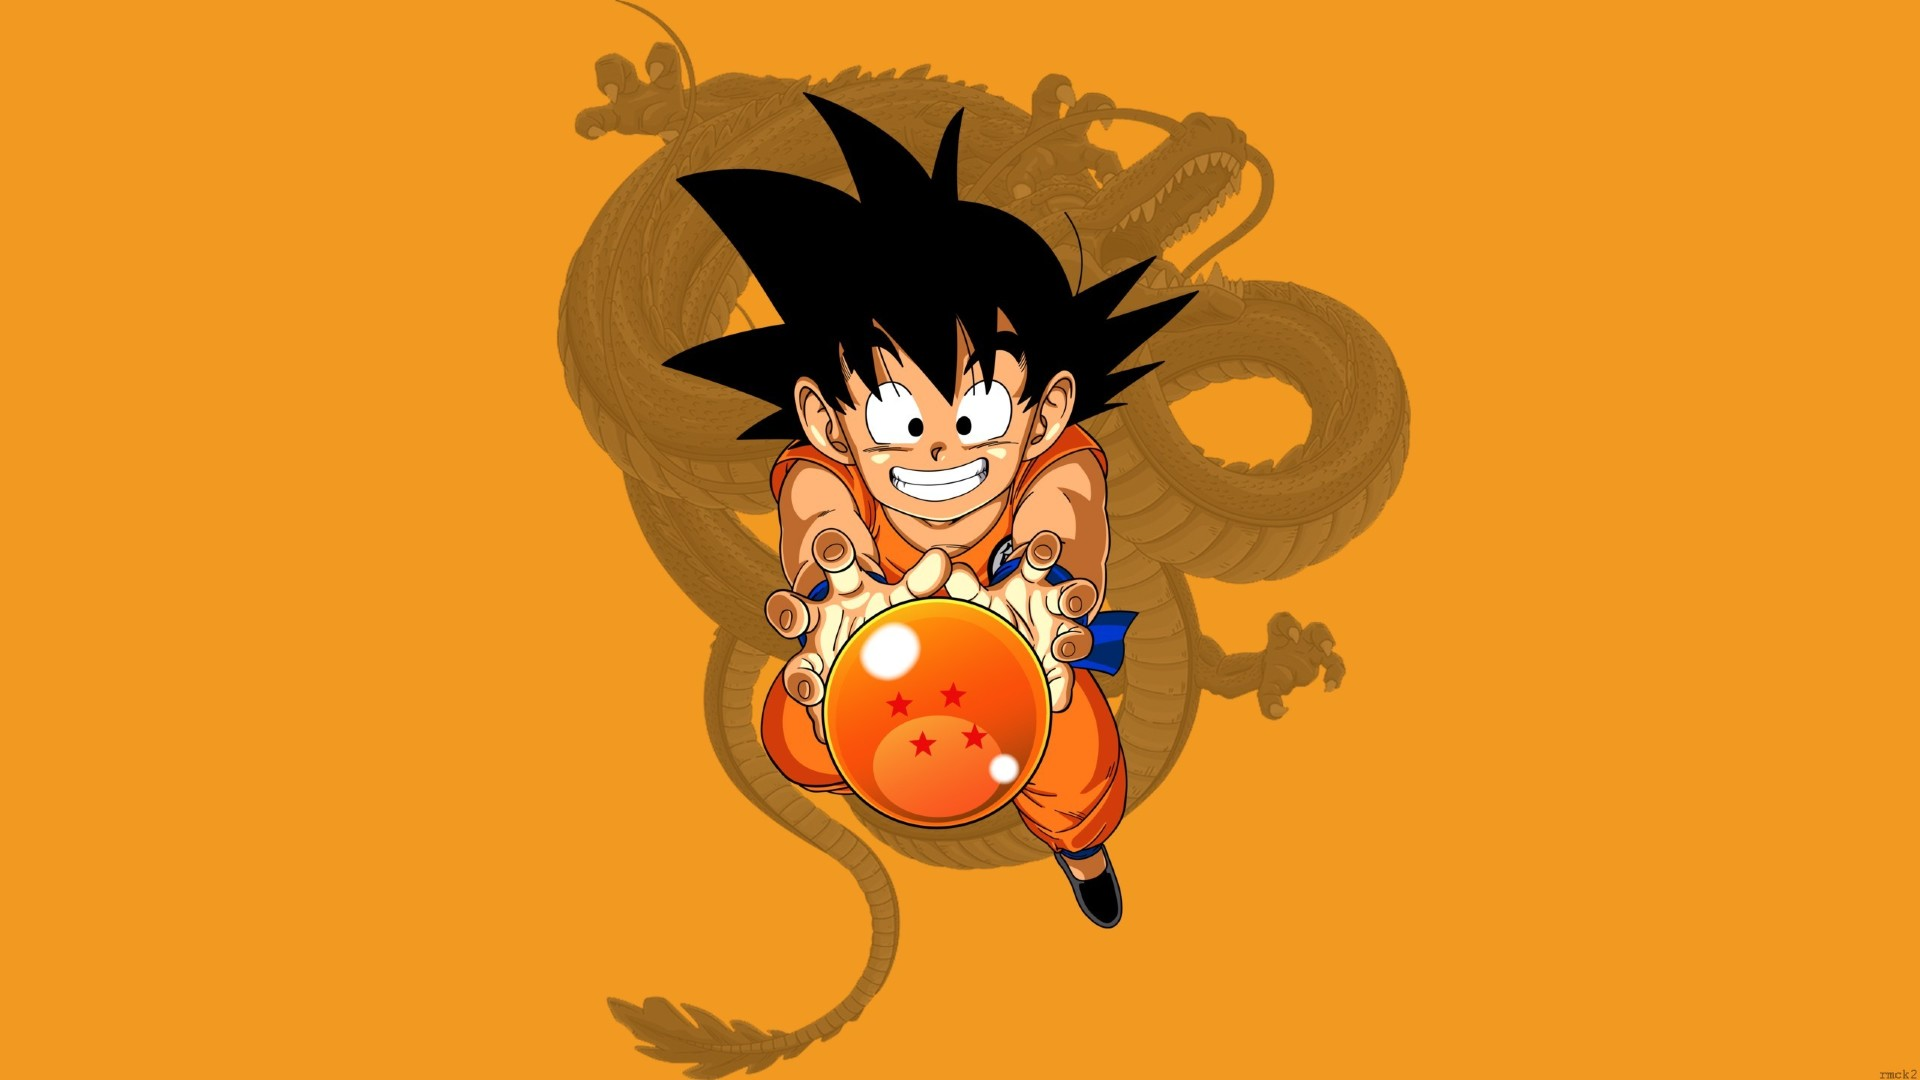 1920x1080 Kid Goku Dragon Ball Z 1080p Laptop Full Hd